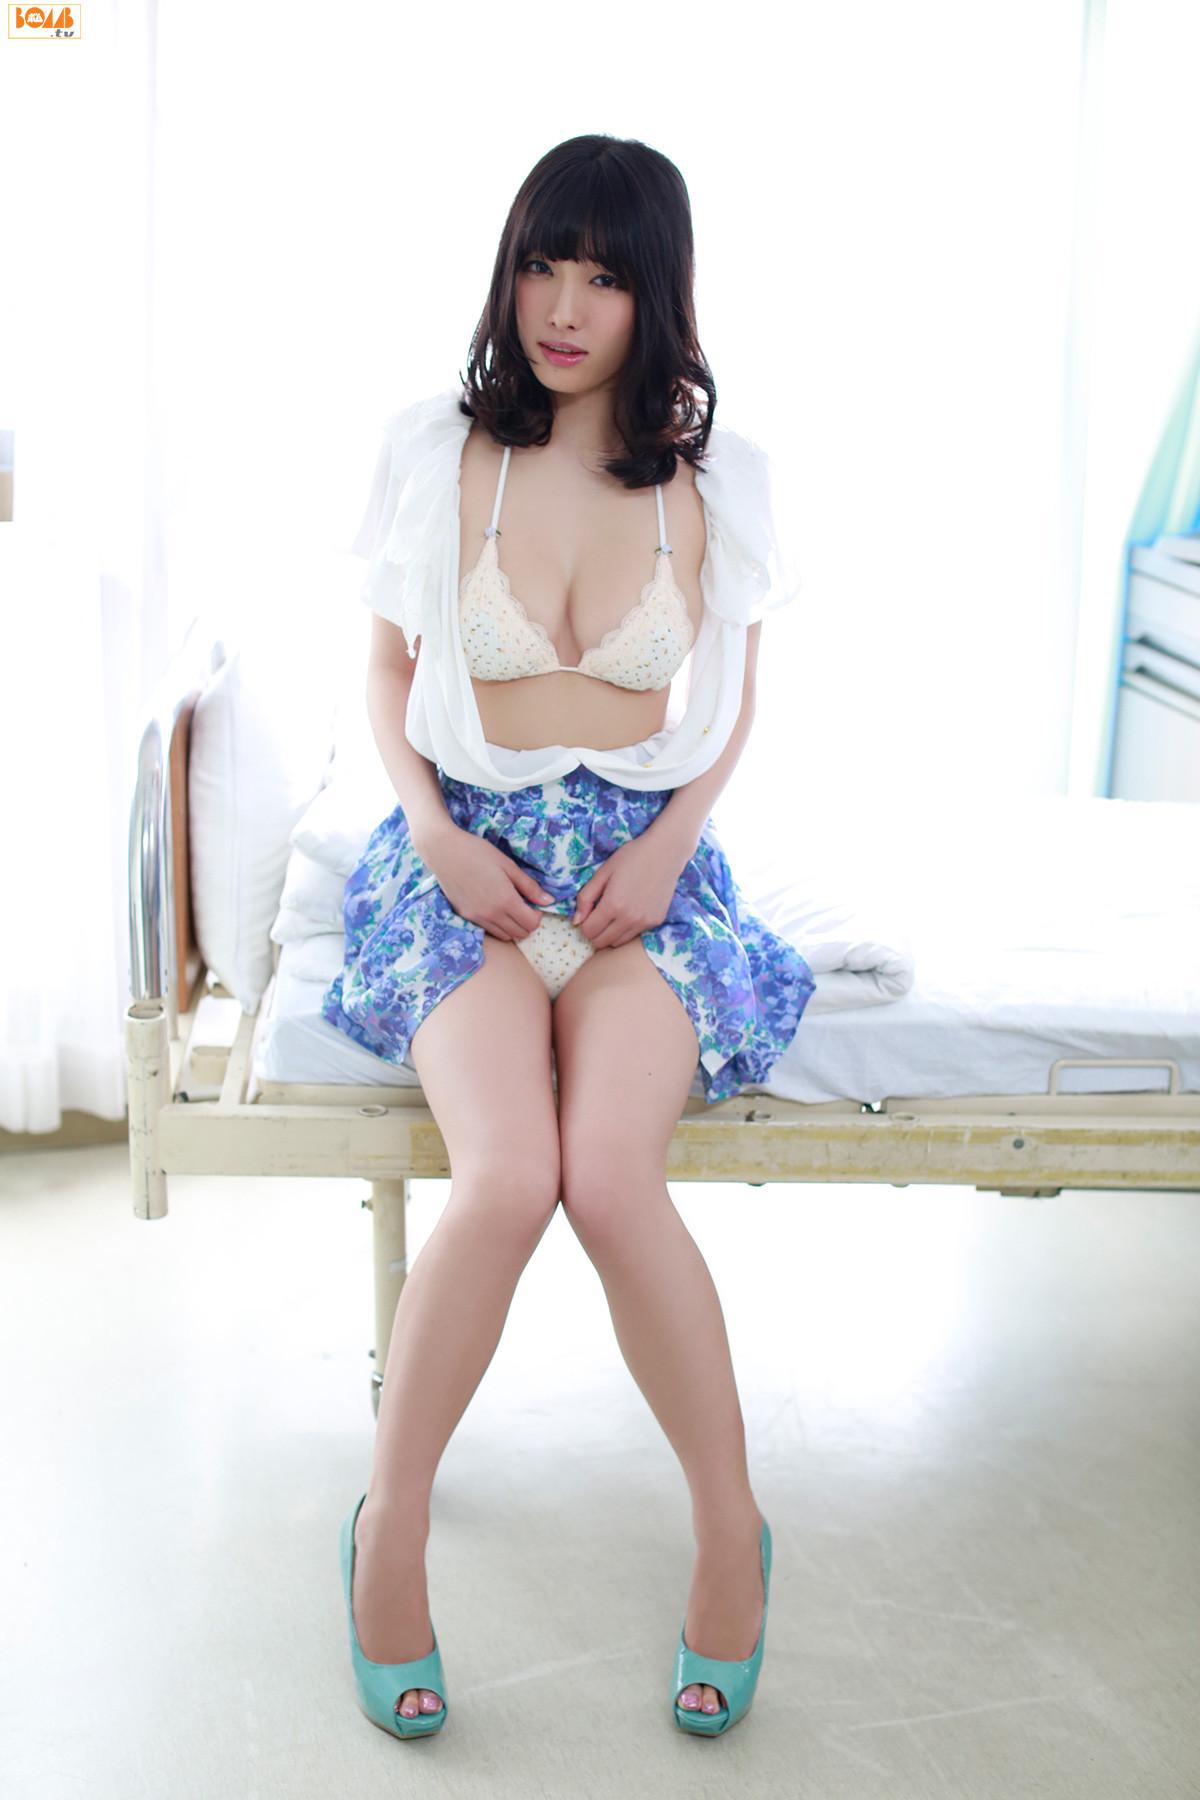 [BOMB.tv] GRAVURE Channel 2013年09月号 今野杏南X岸明日香 045